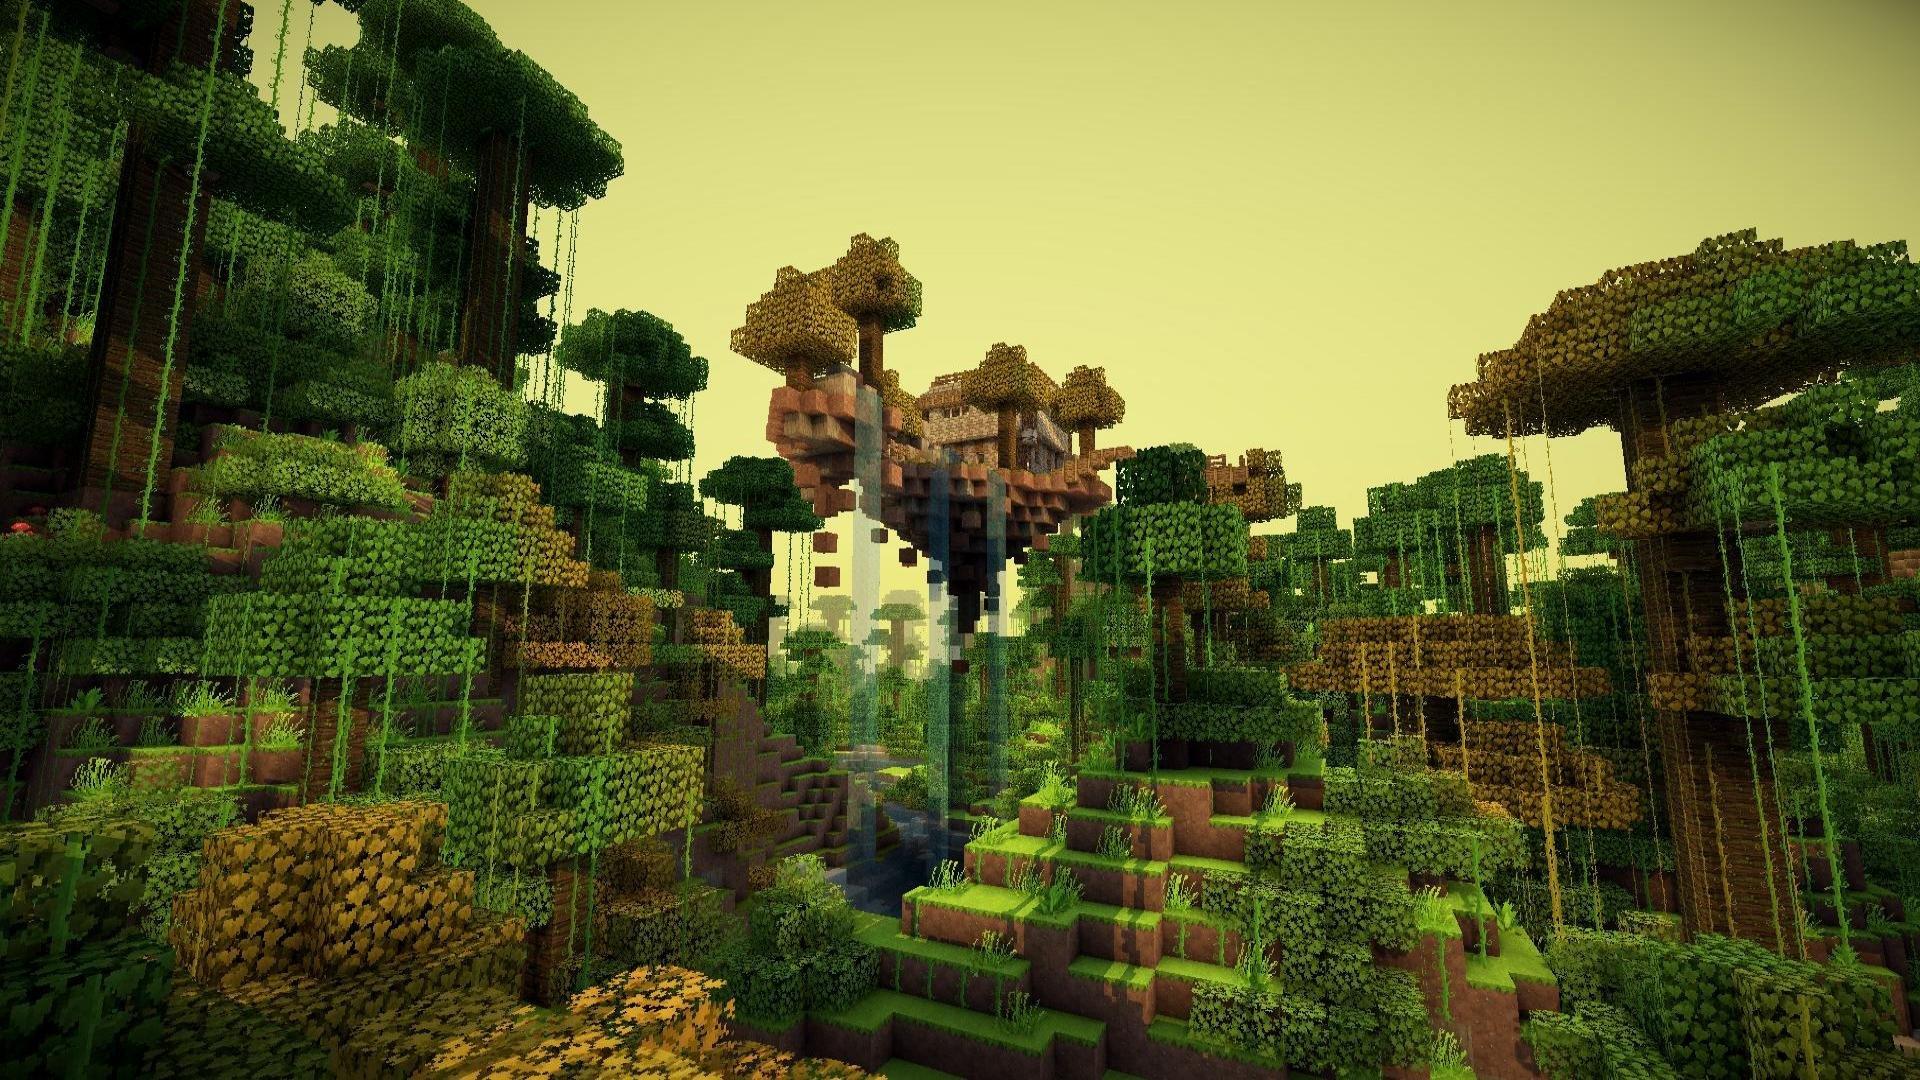 Full-HD-p-Minecraft-HD-Desktop-Backgrounds-wallpaper-wpc5805225